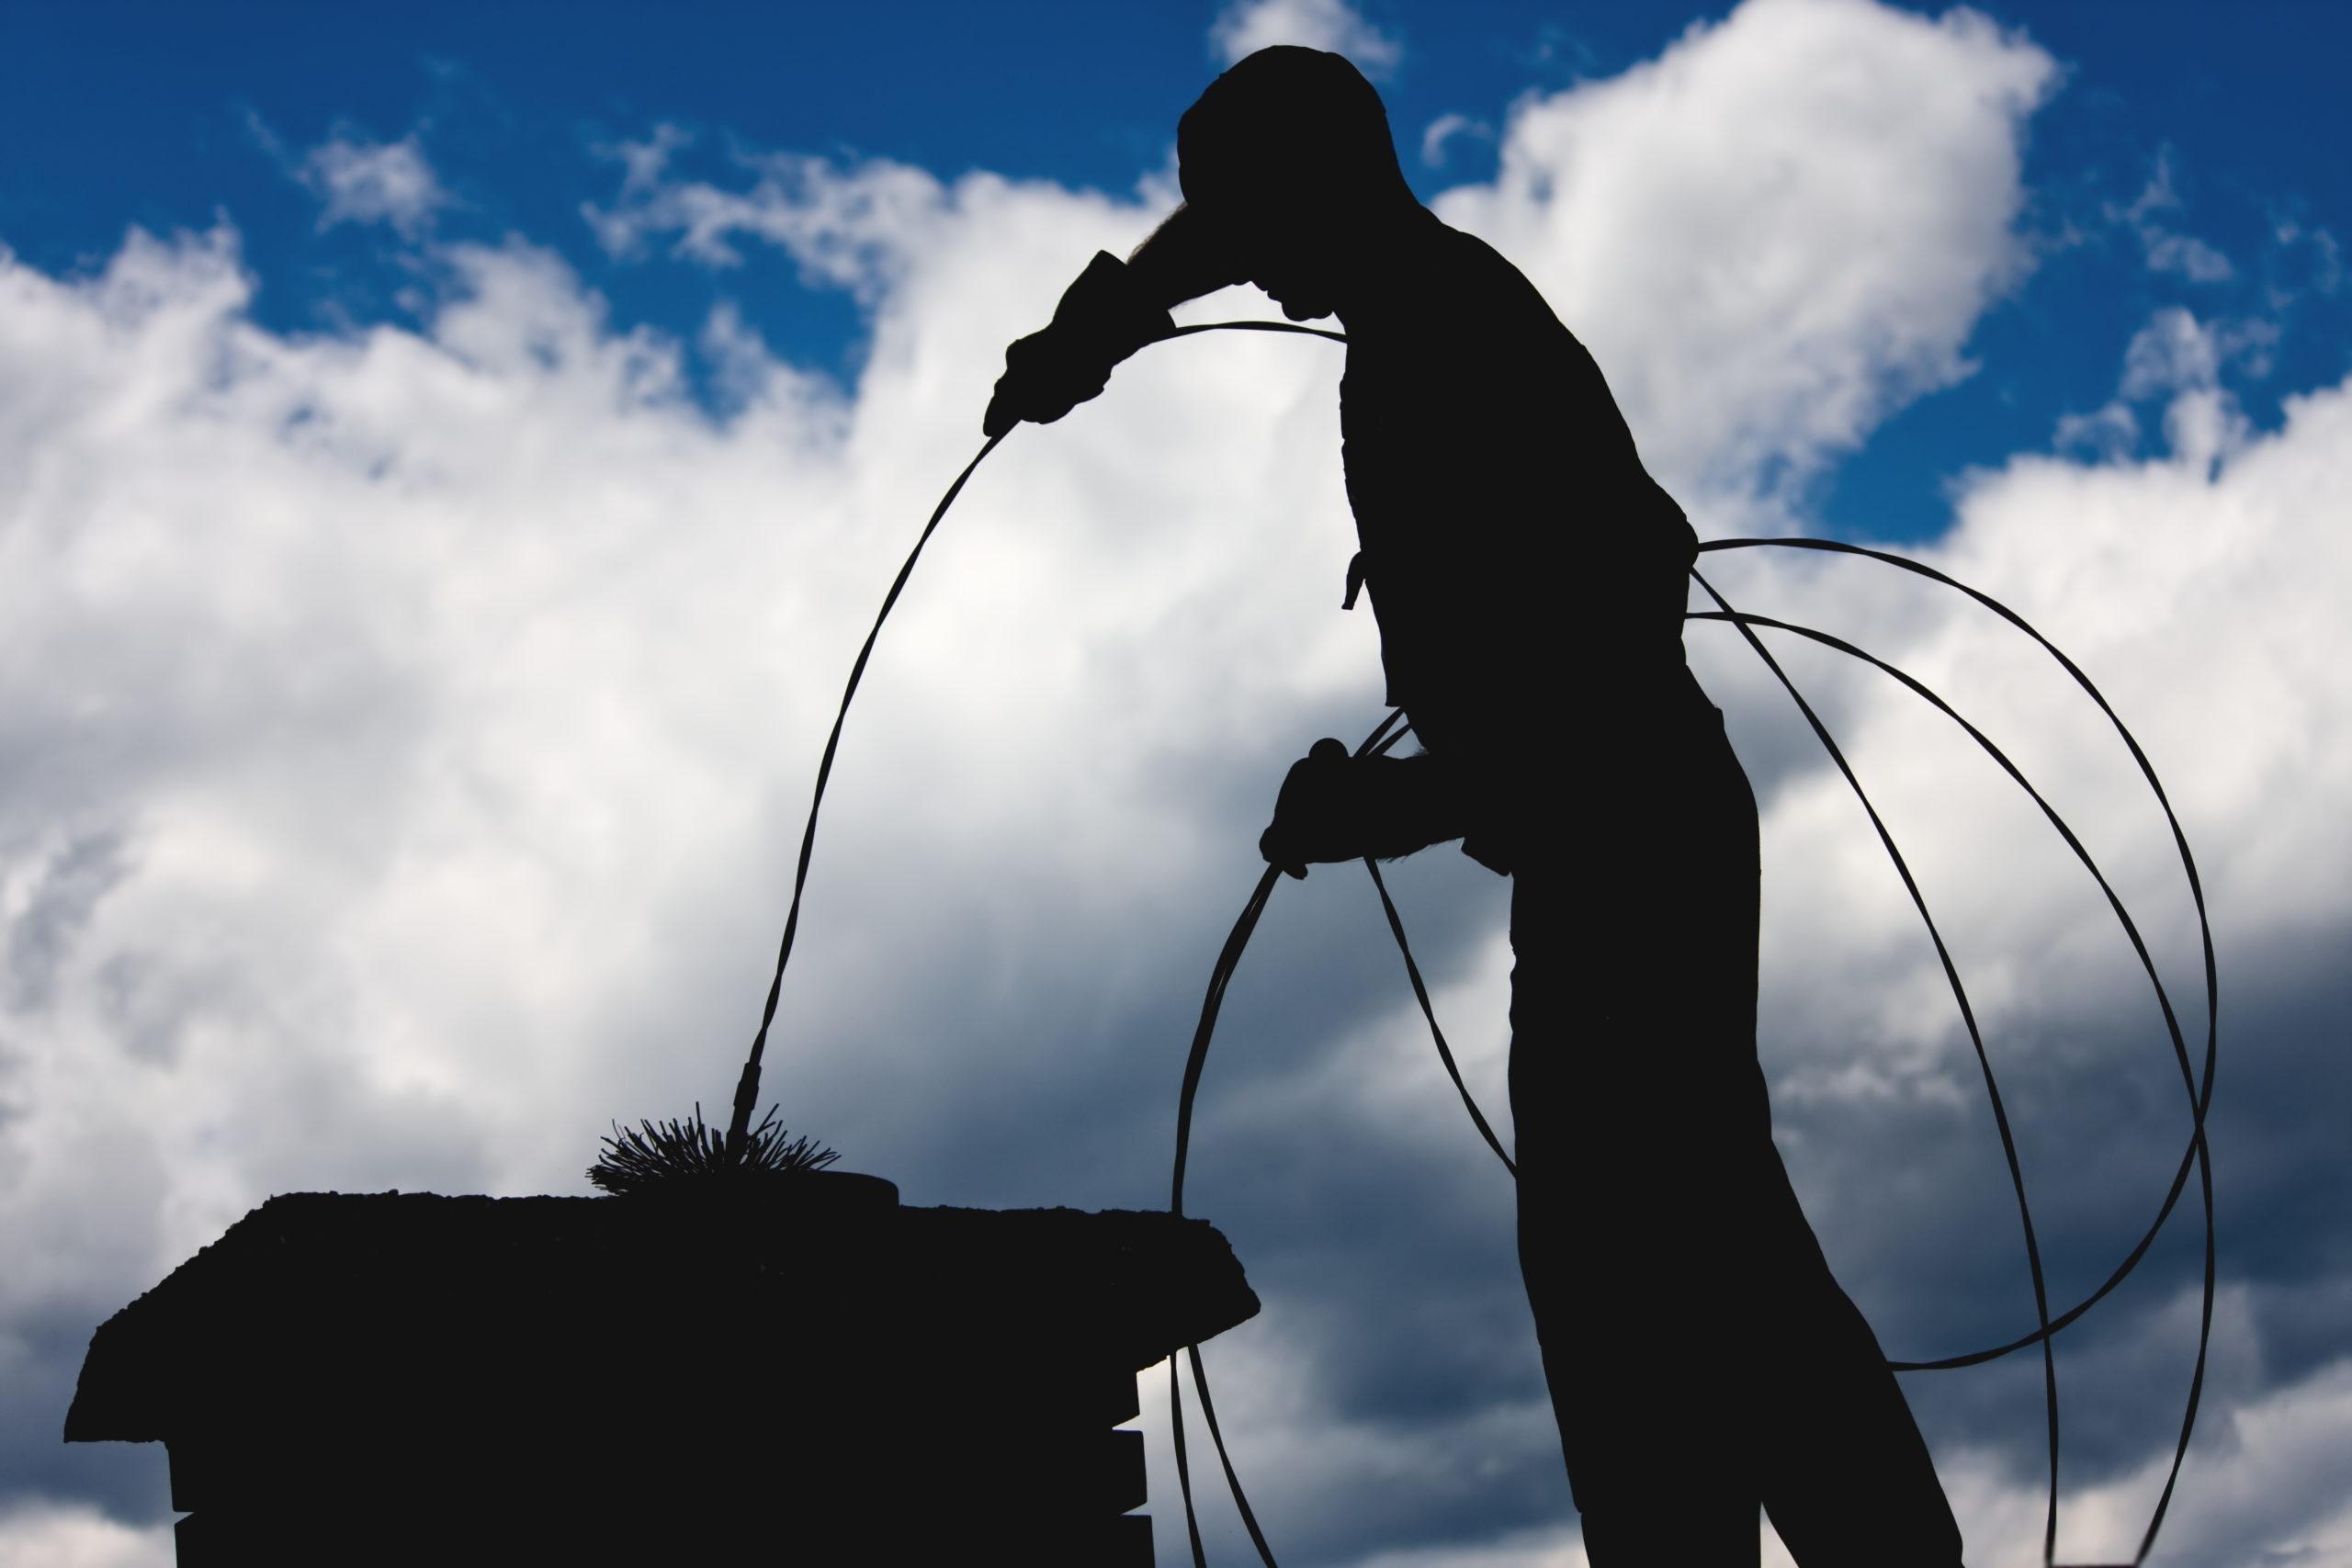 Chimney sweep maintenance